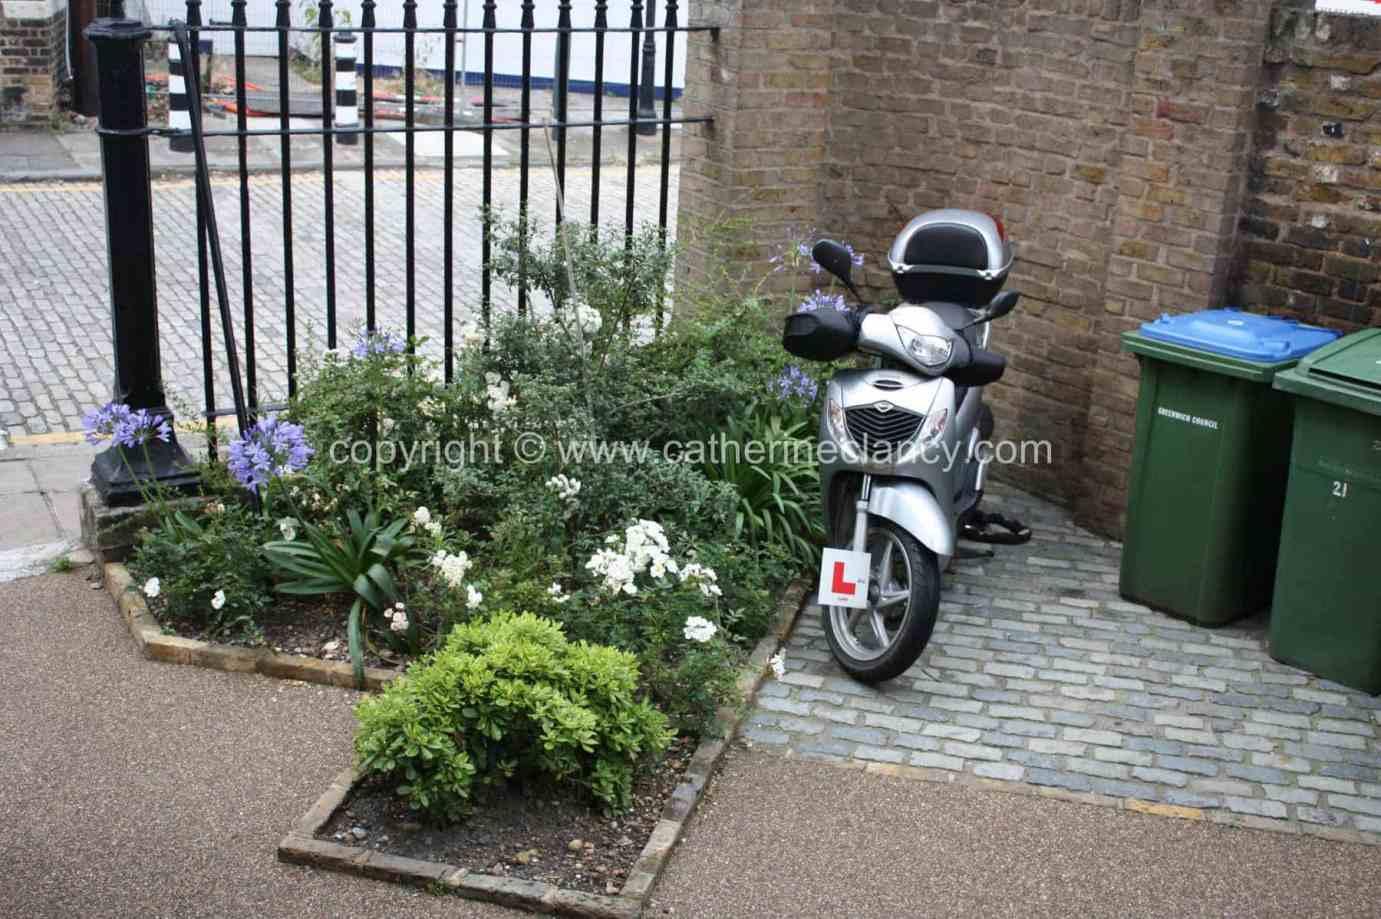 london-courtyard-front-garden-5